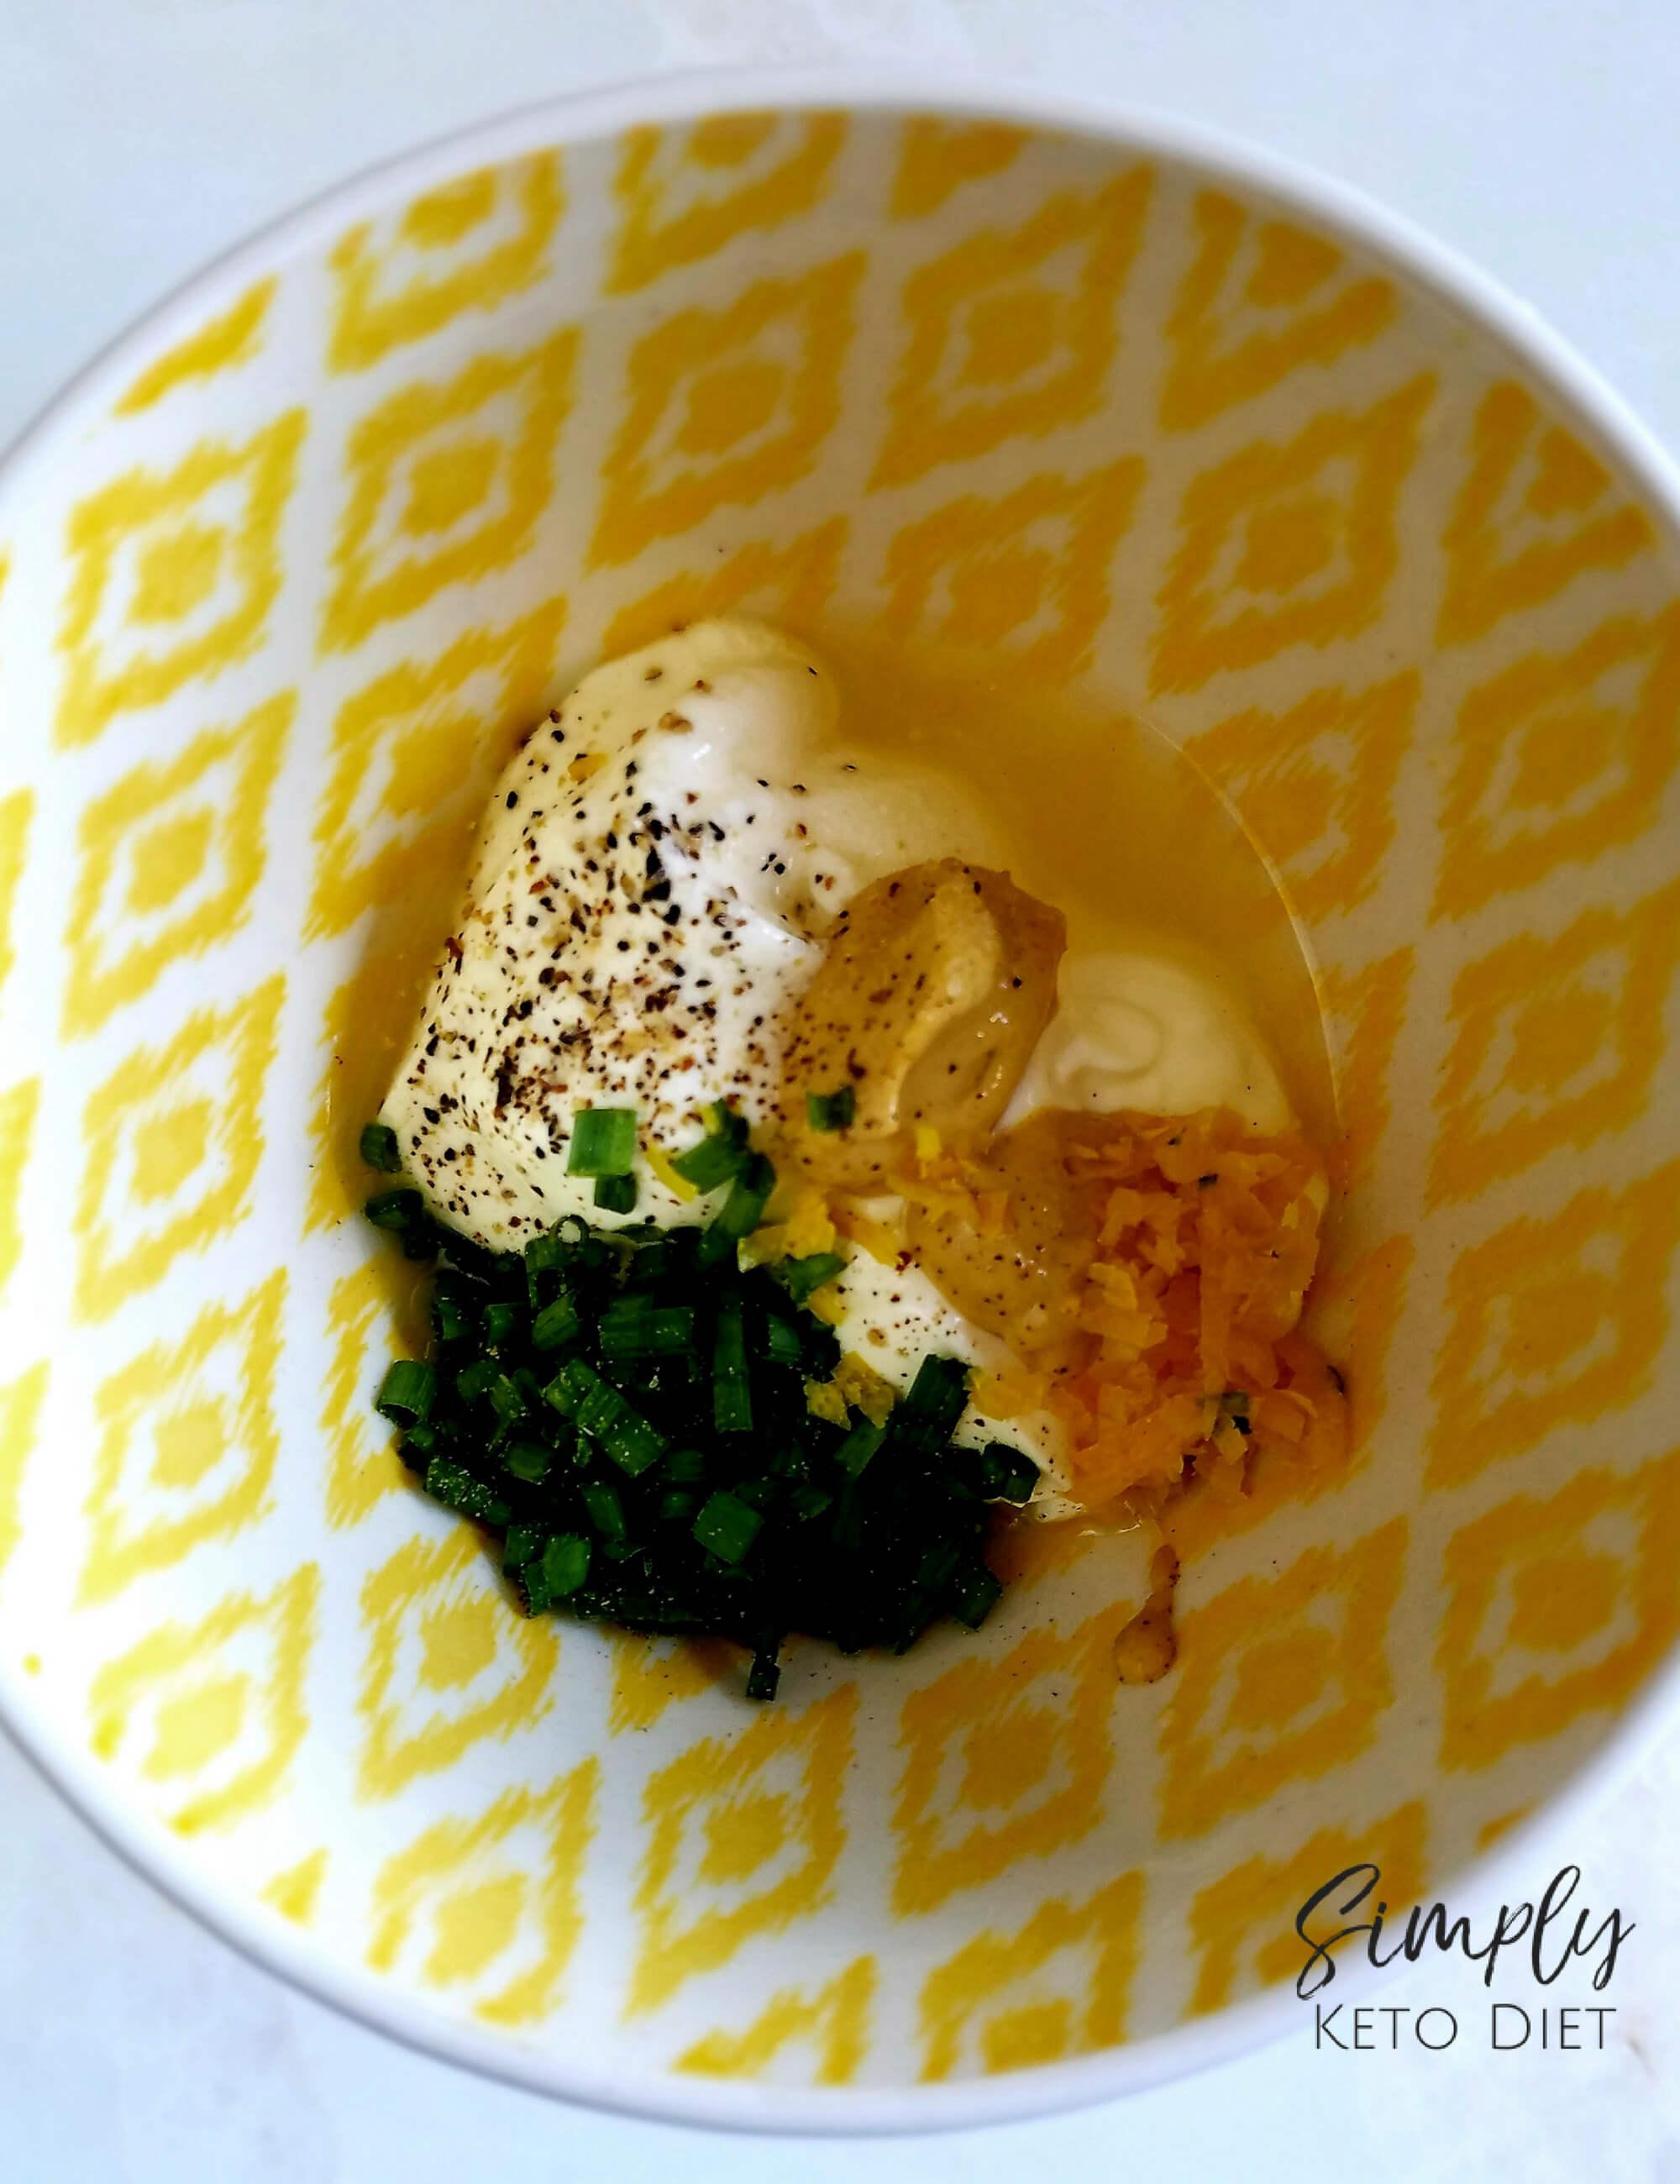 The Lemon Dijon Sauce is the star of this tuna cake recipe!